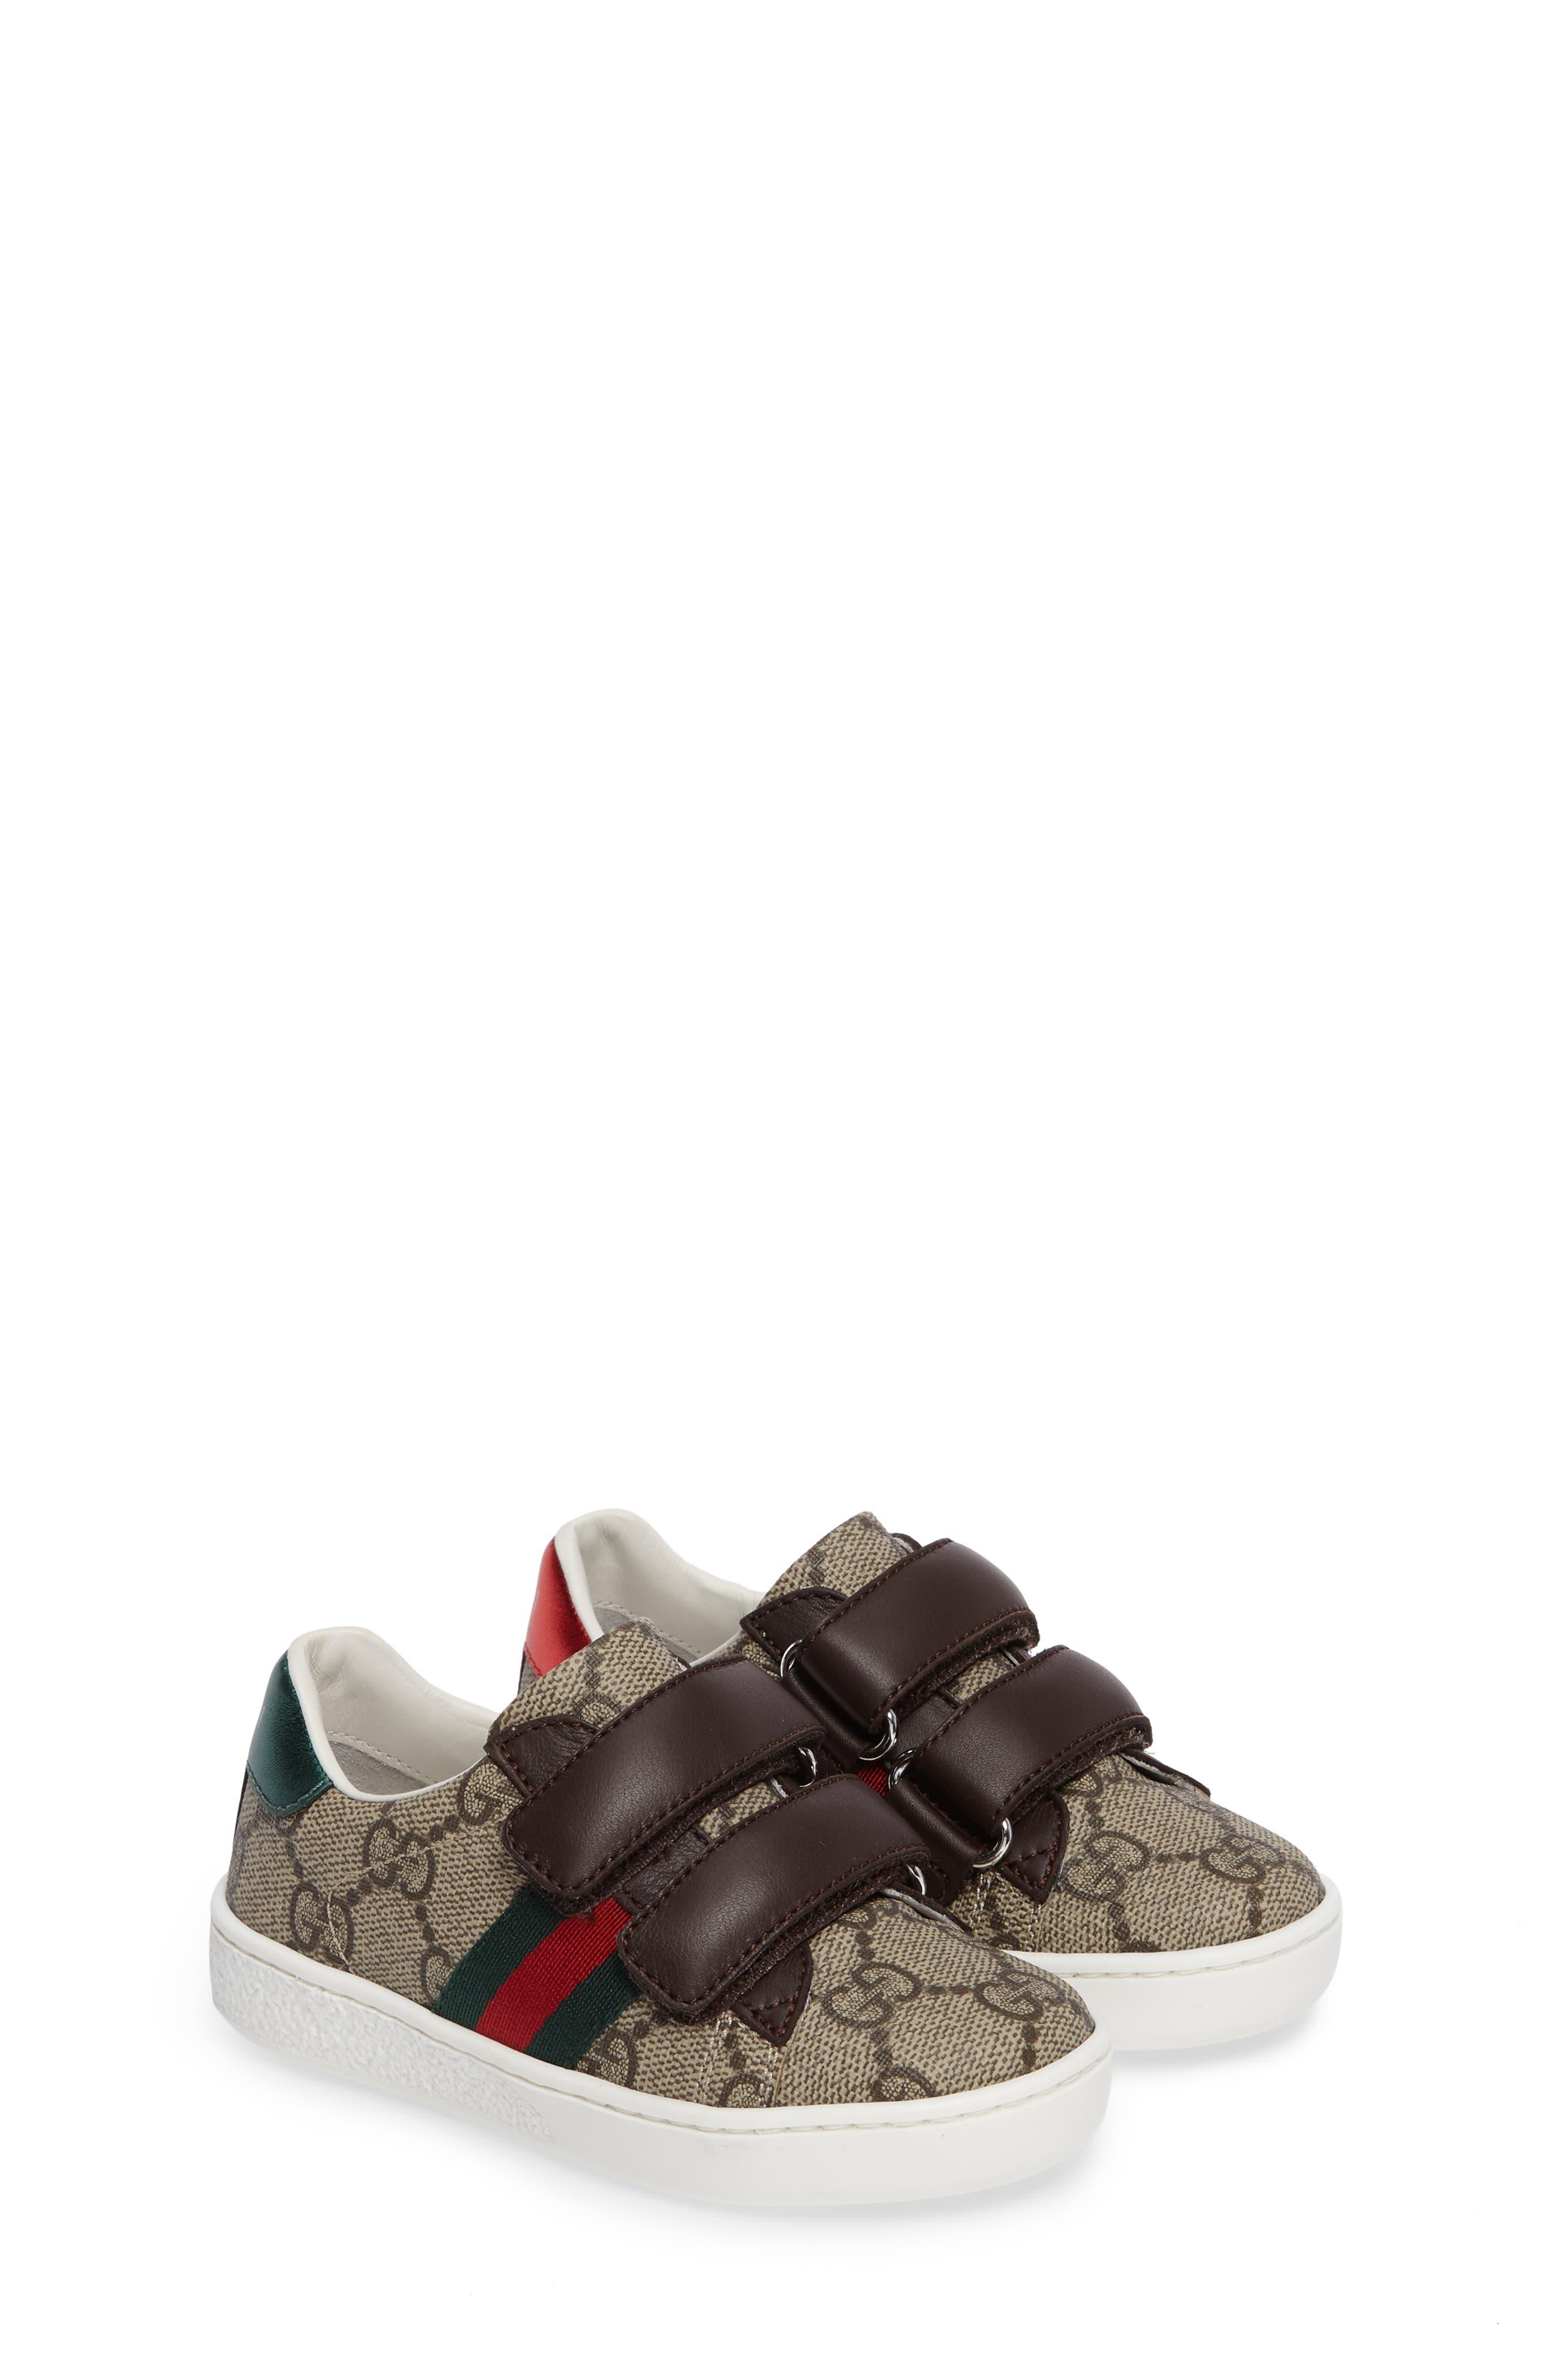 Alternate Image 2  - Gucci New Ace Monogram Sneaker (Baby, Walker, Toddler, Little Kid & Big Kid)